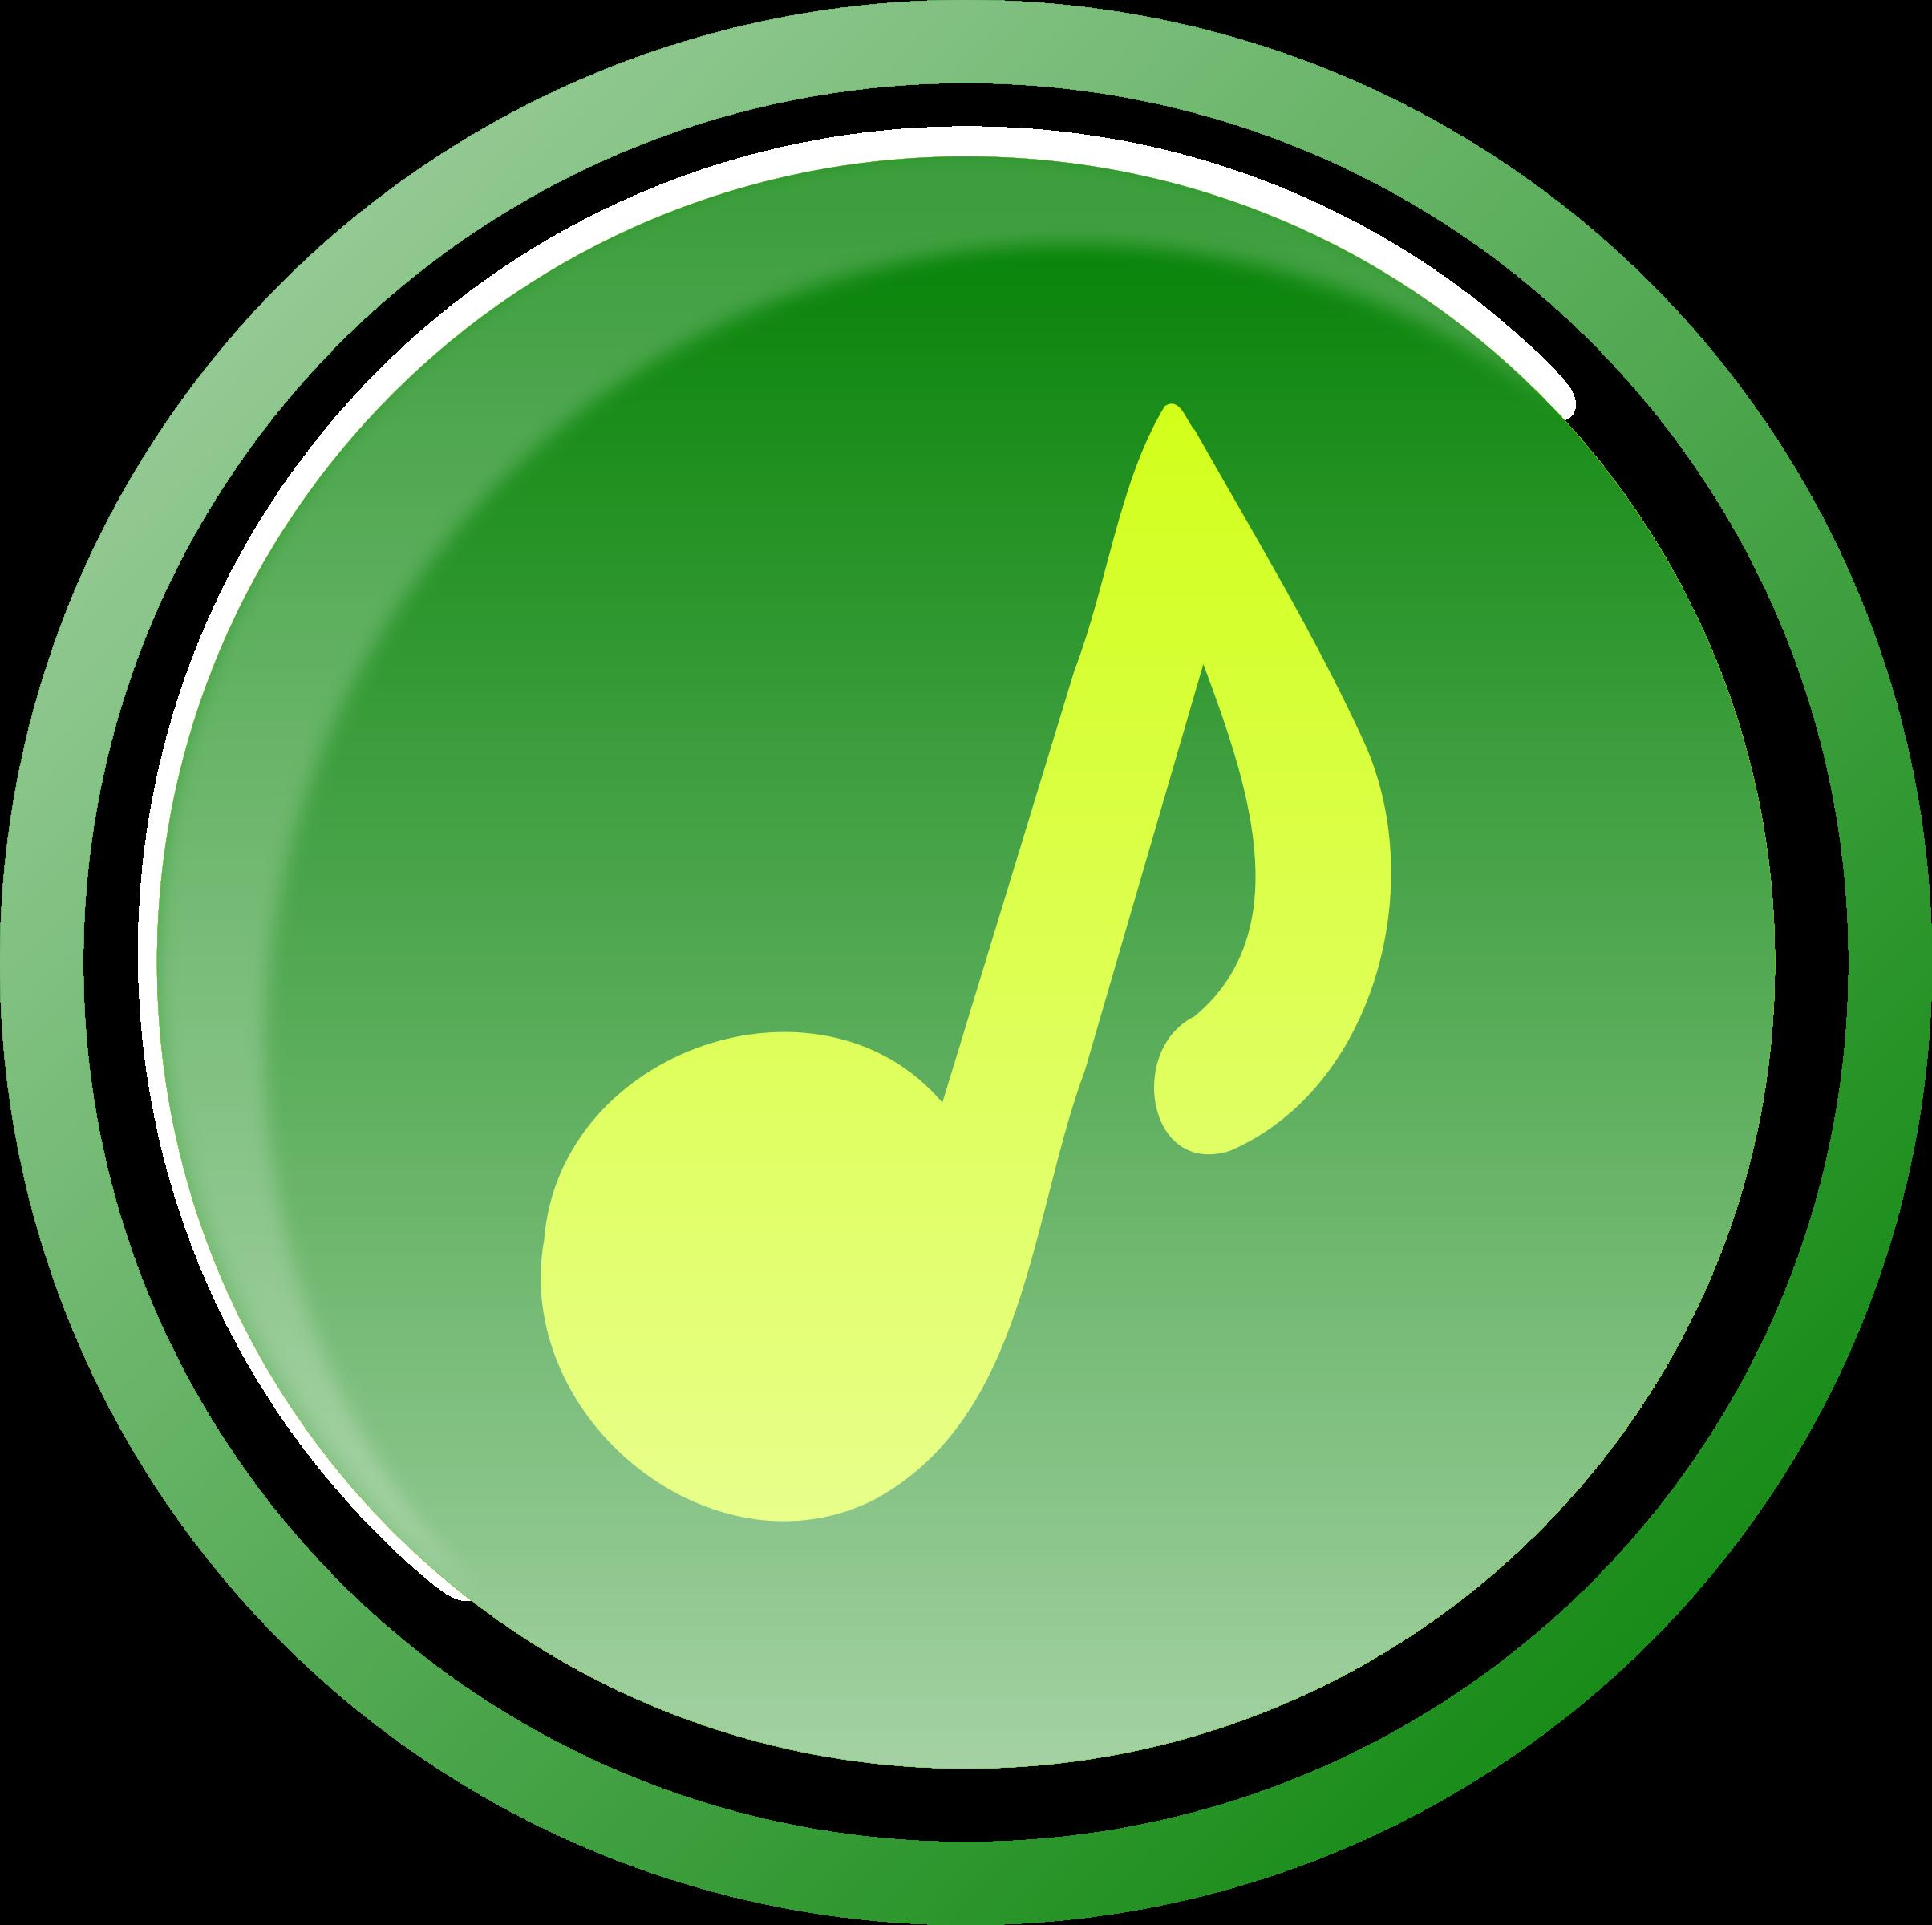 Music icon big image. 1 clipart green